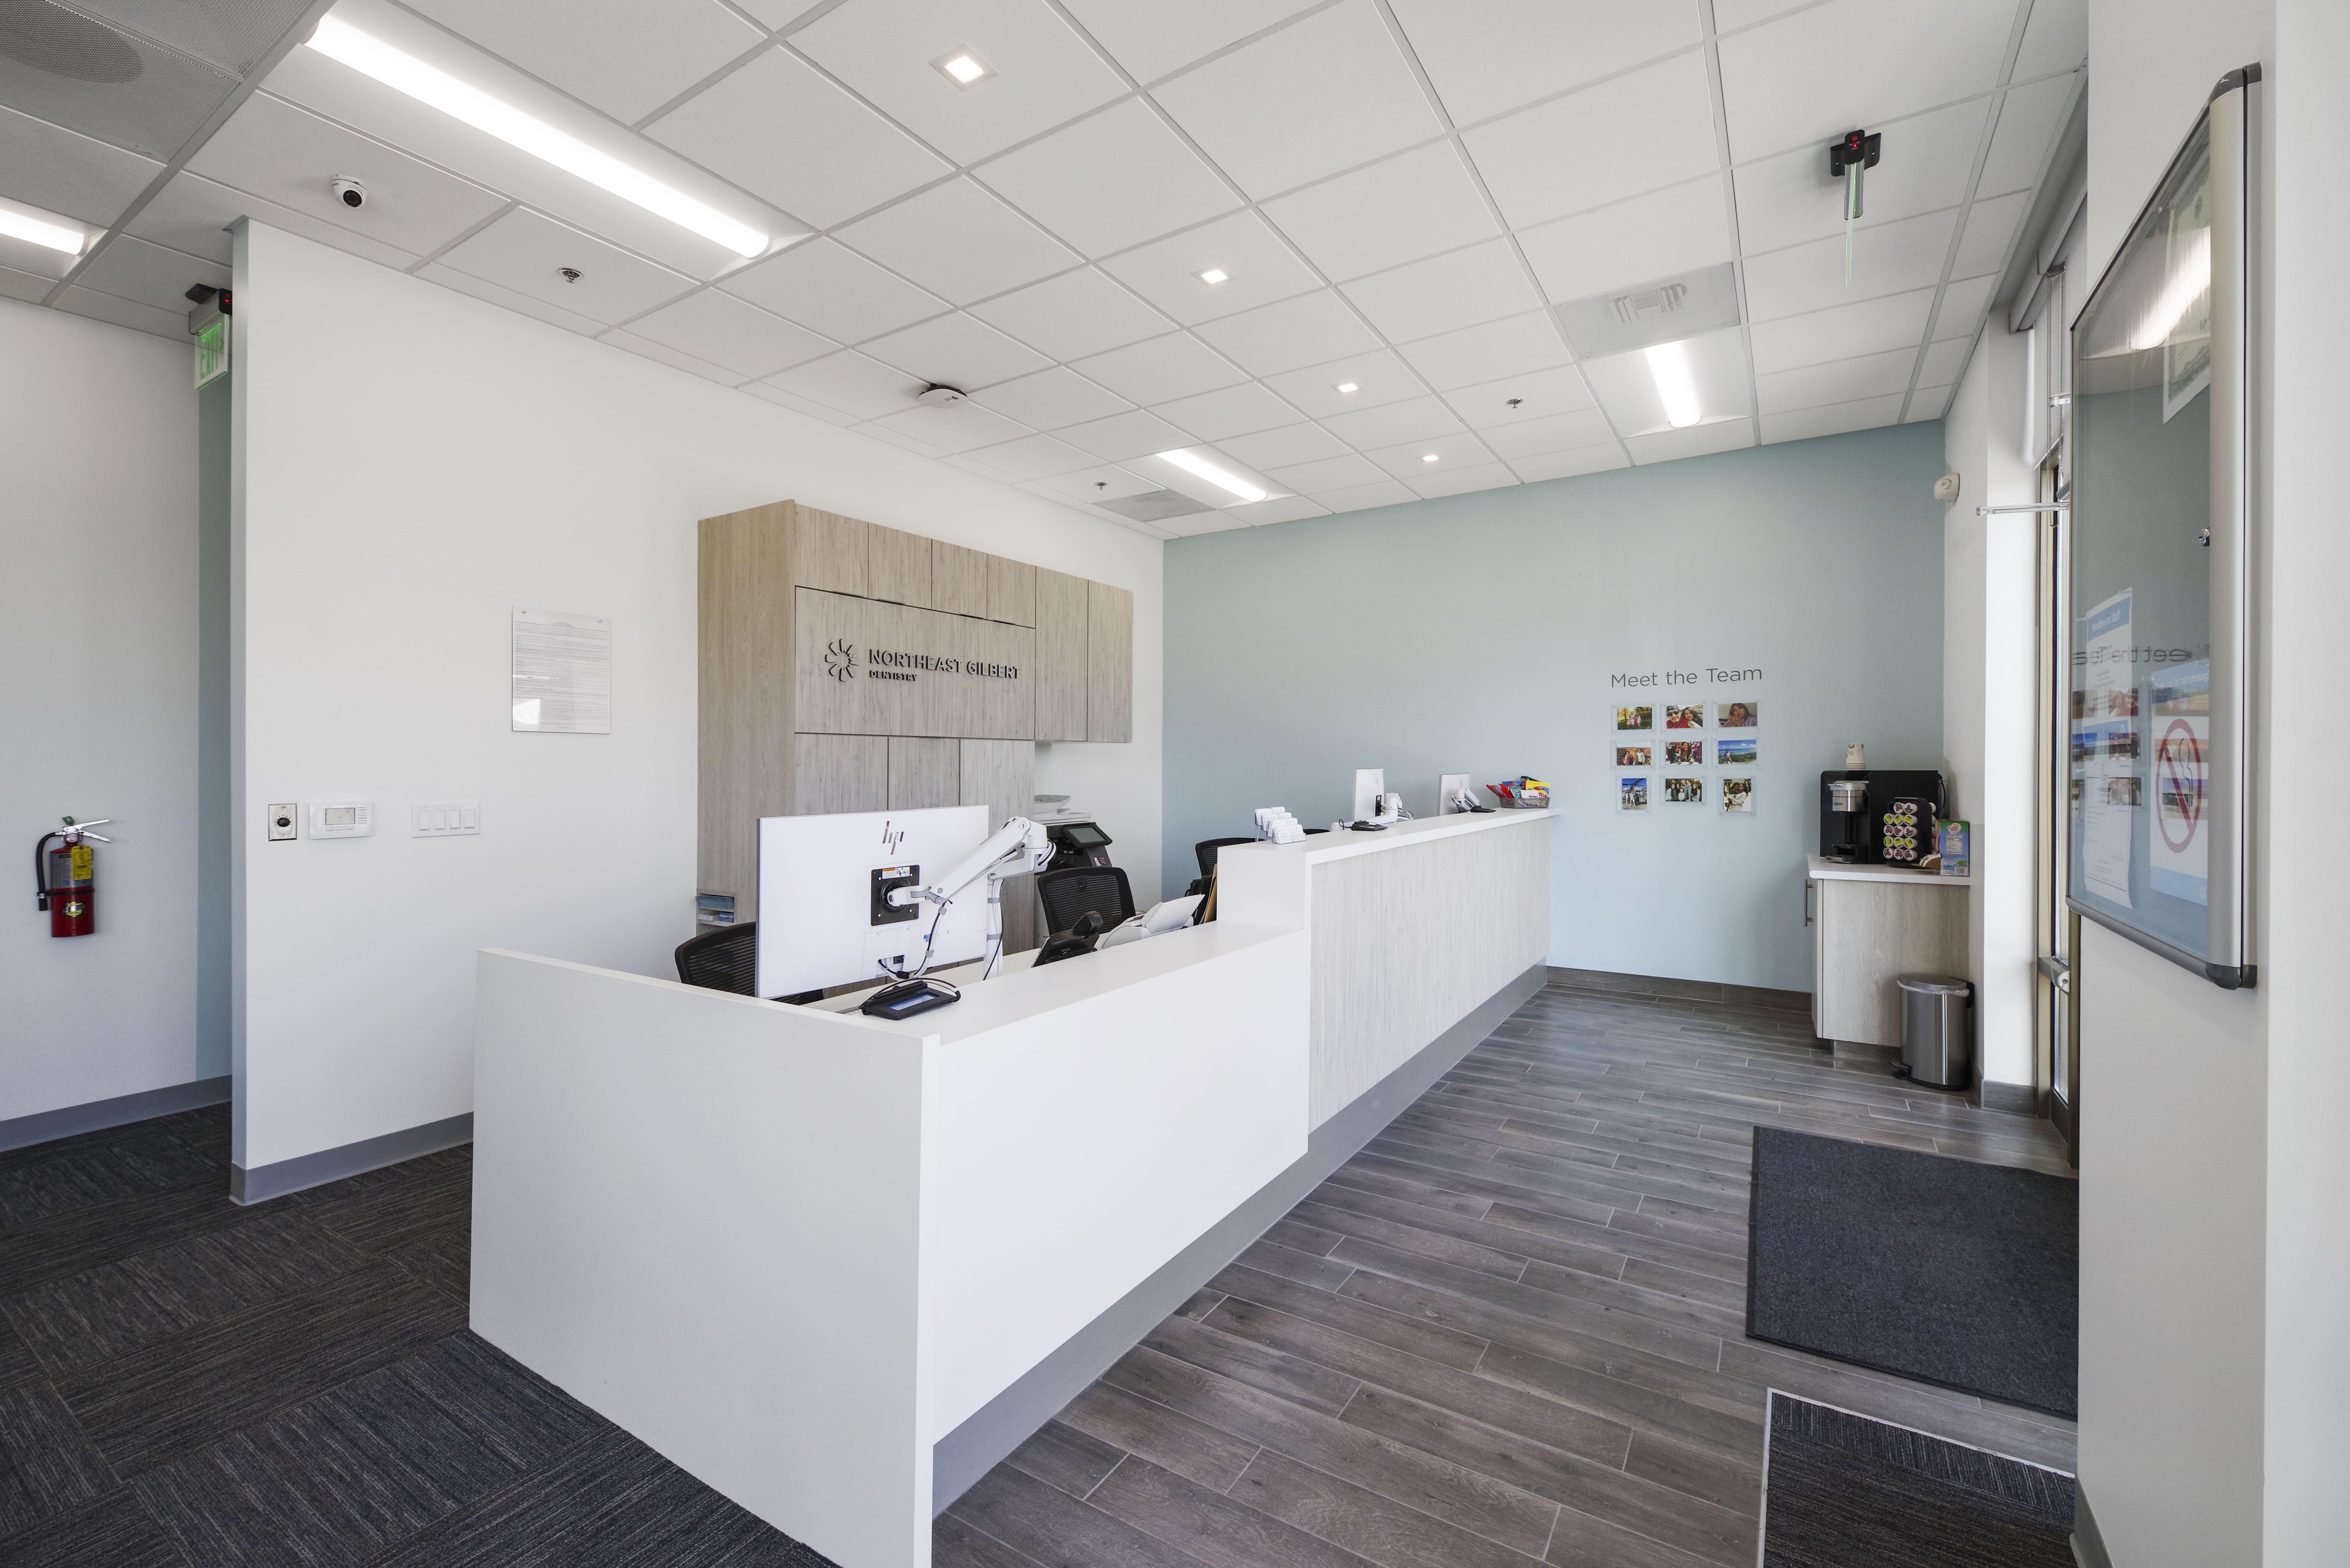 Northeast Gilbert Dentistry